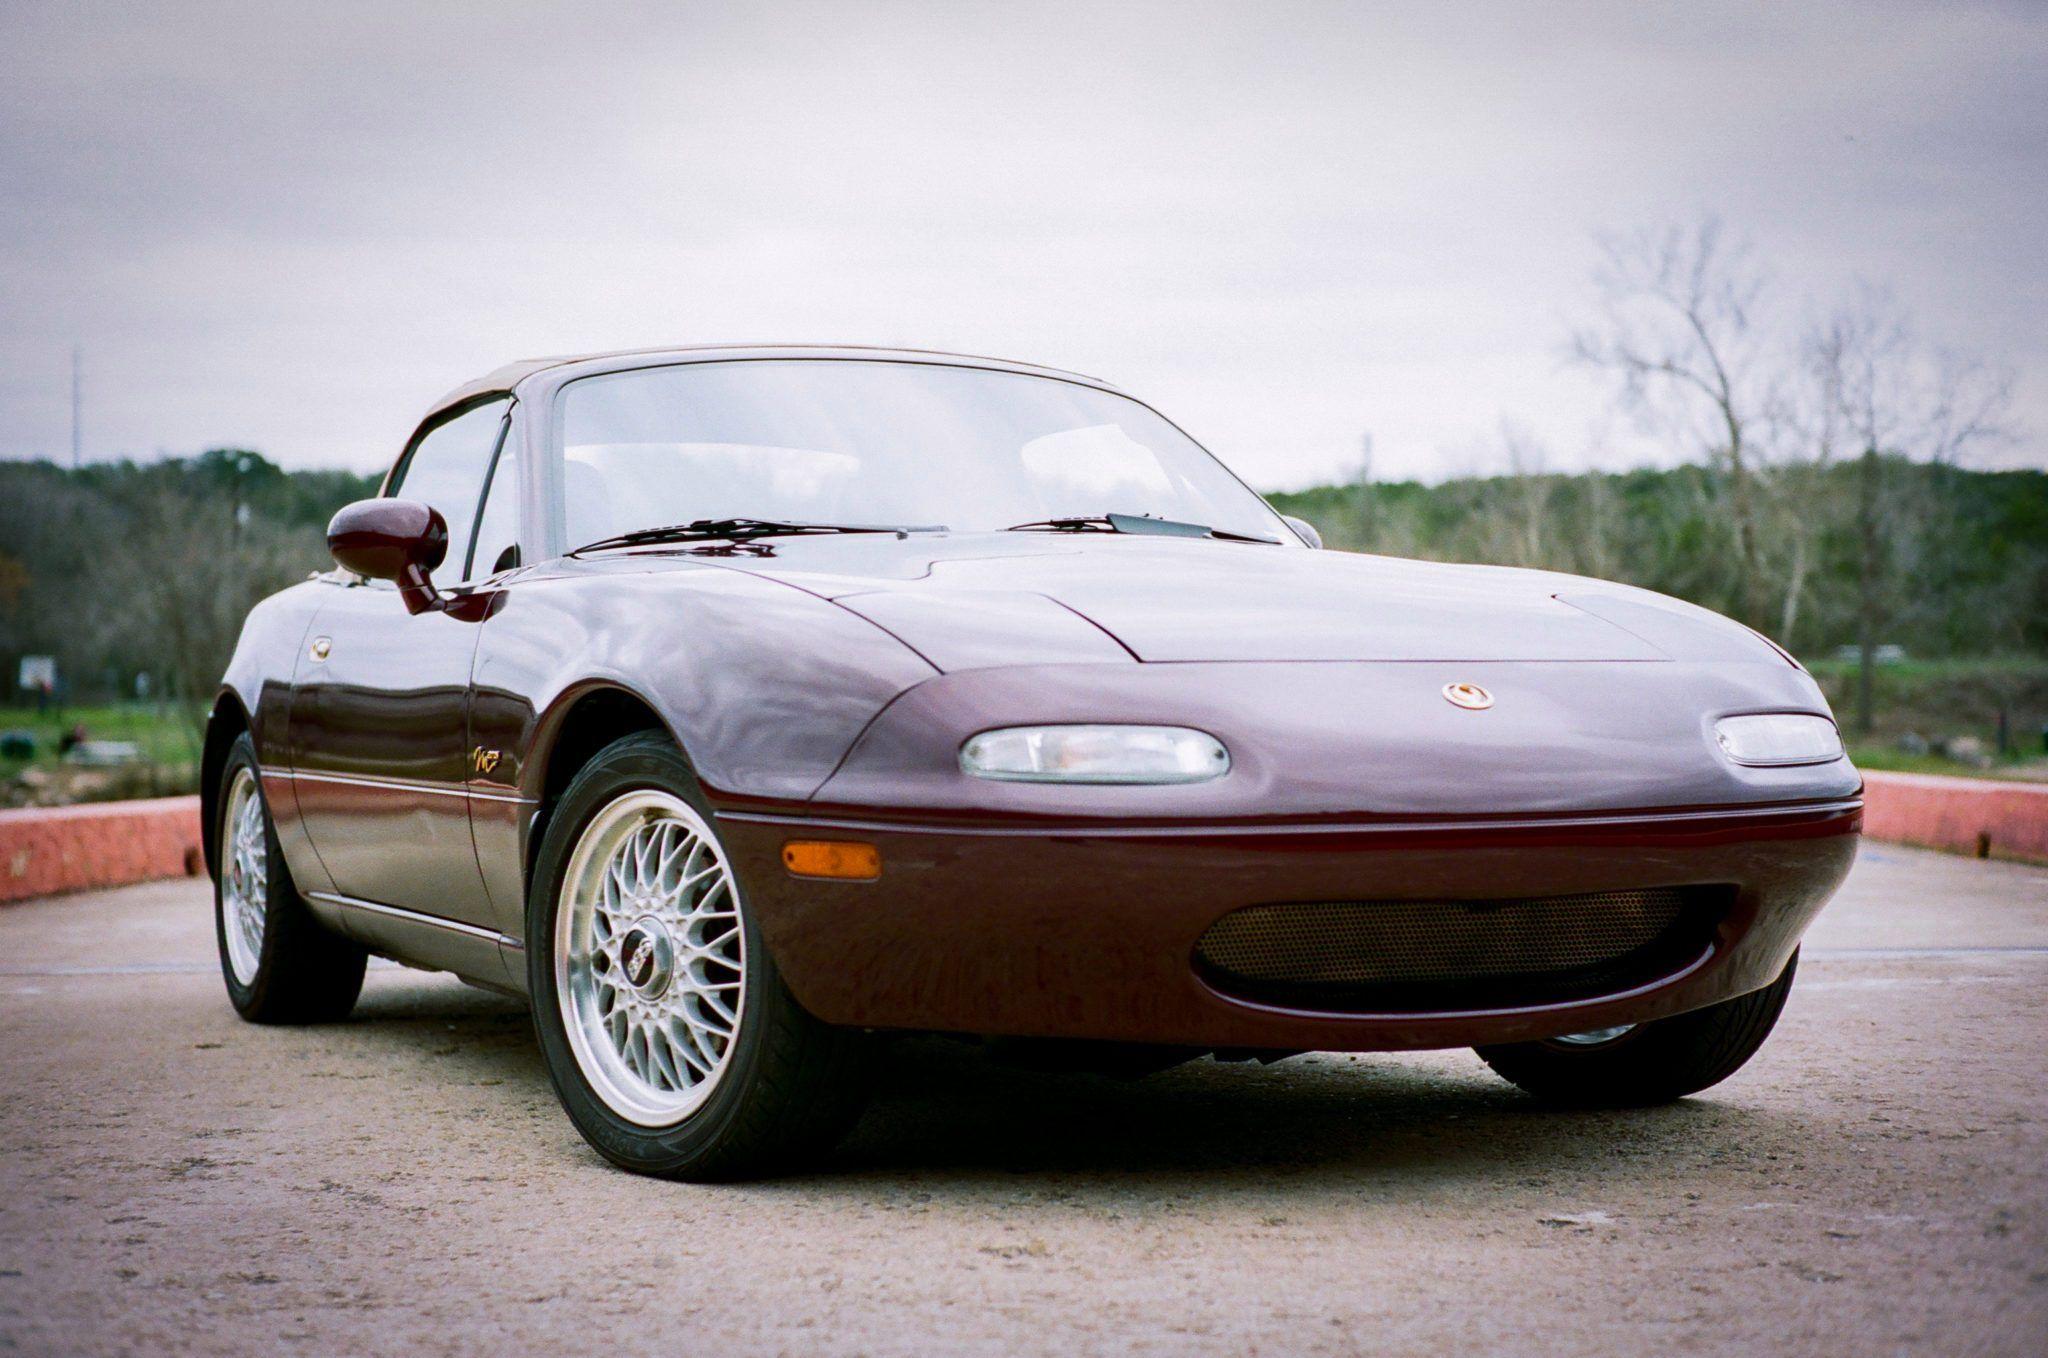 No Reserve 1995 Mazda Miata M Edition Mazda Miata Miata Mazda